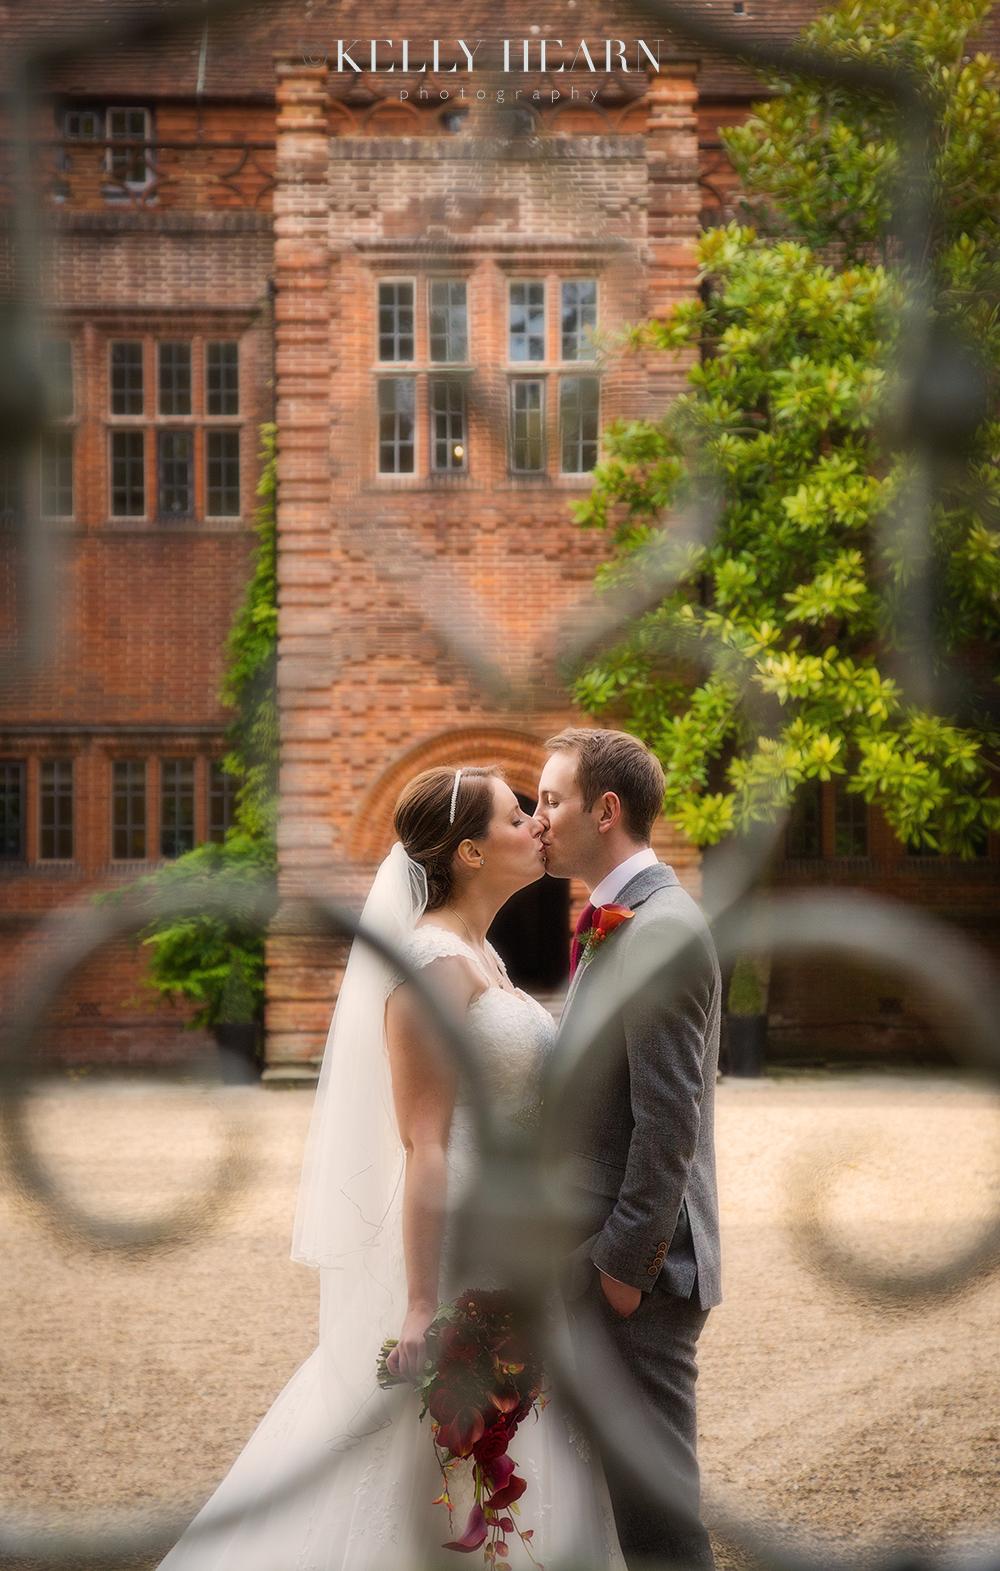 FAG_Bride-and-groom-heart-gates.jpg#asset:1858